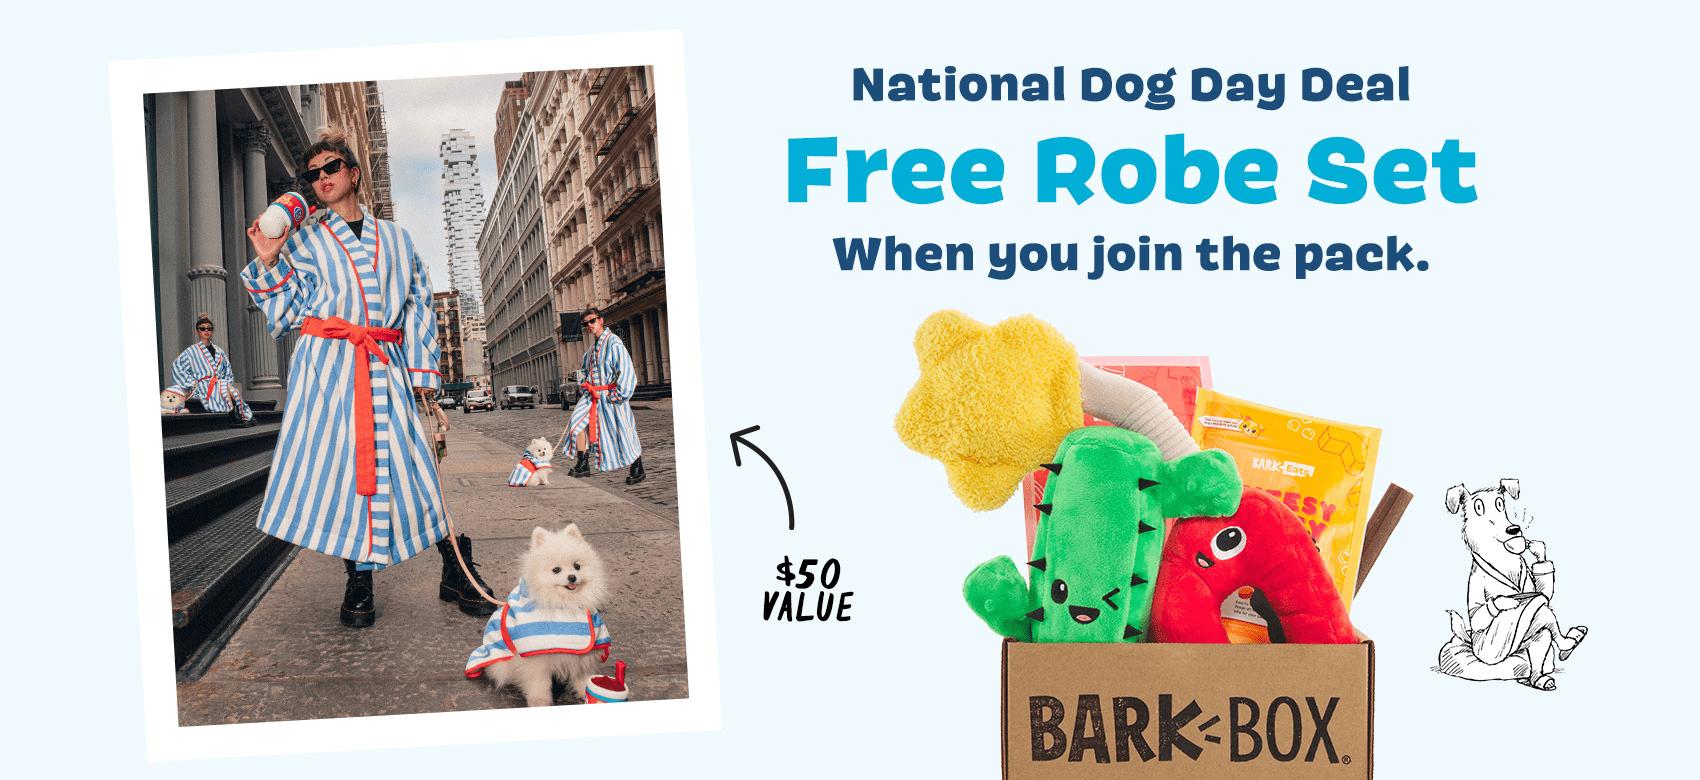 BarkBox Coupon Code: FREE Human + Dog Bathrobe Bundle